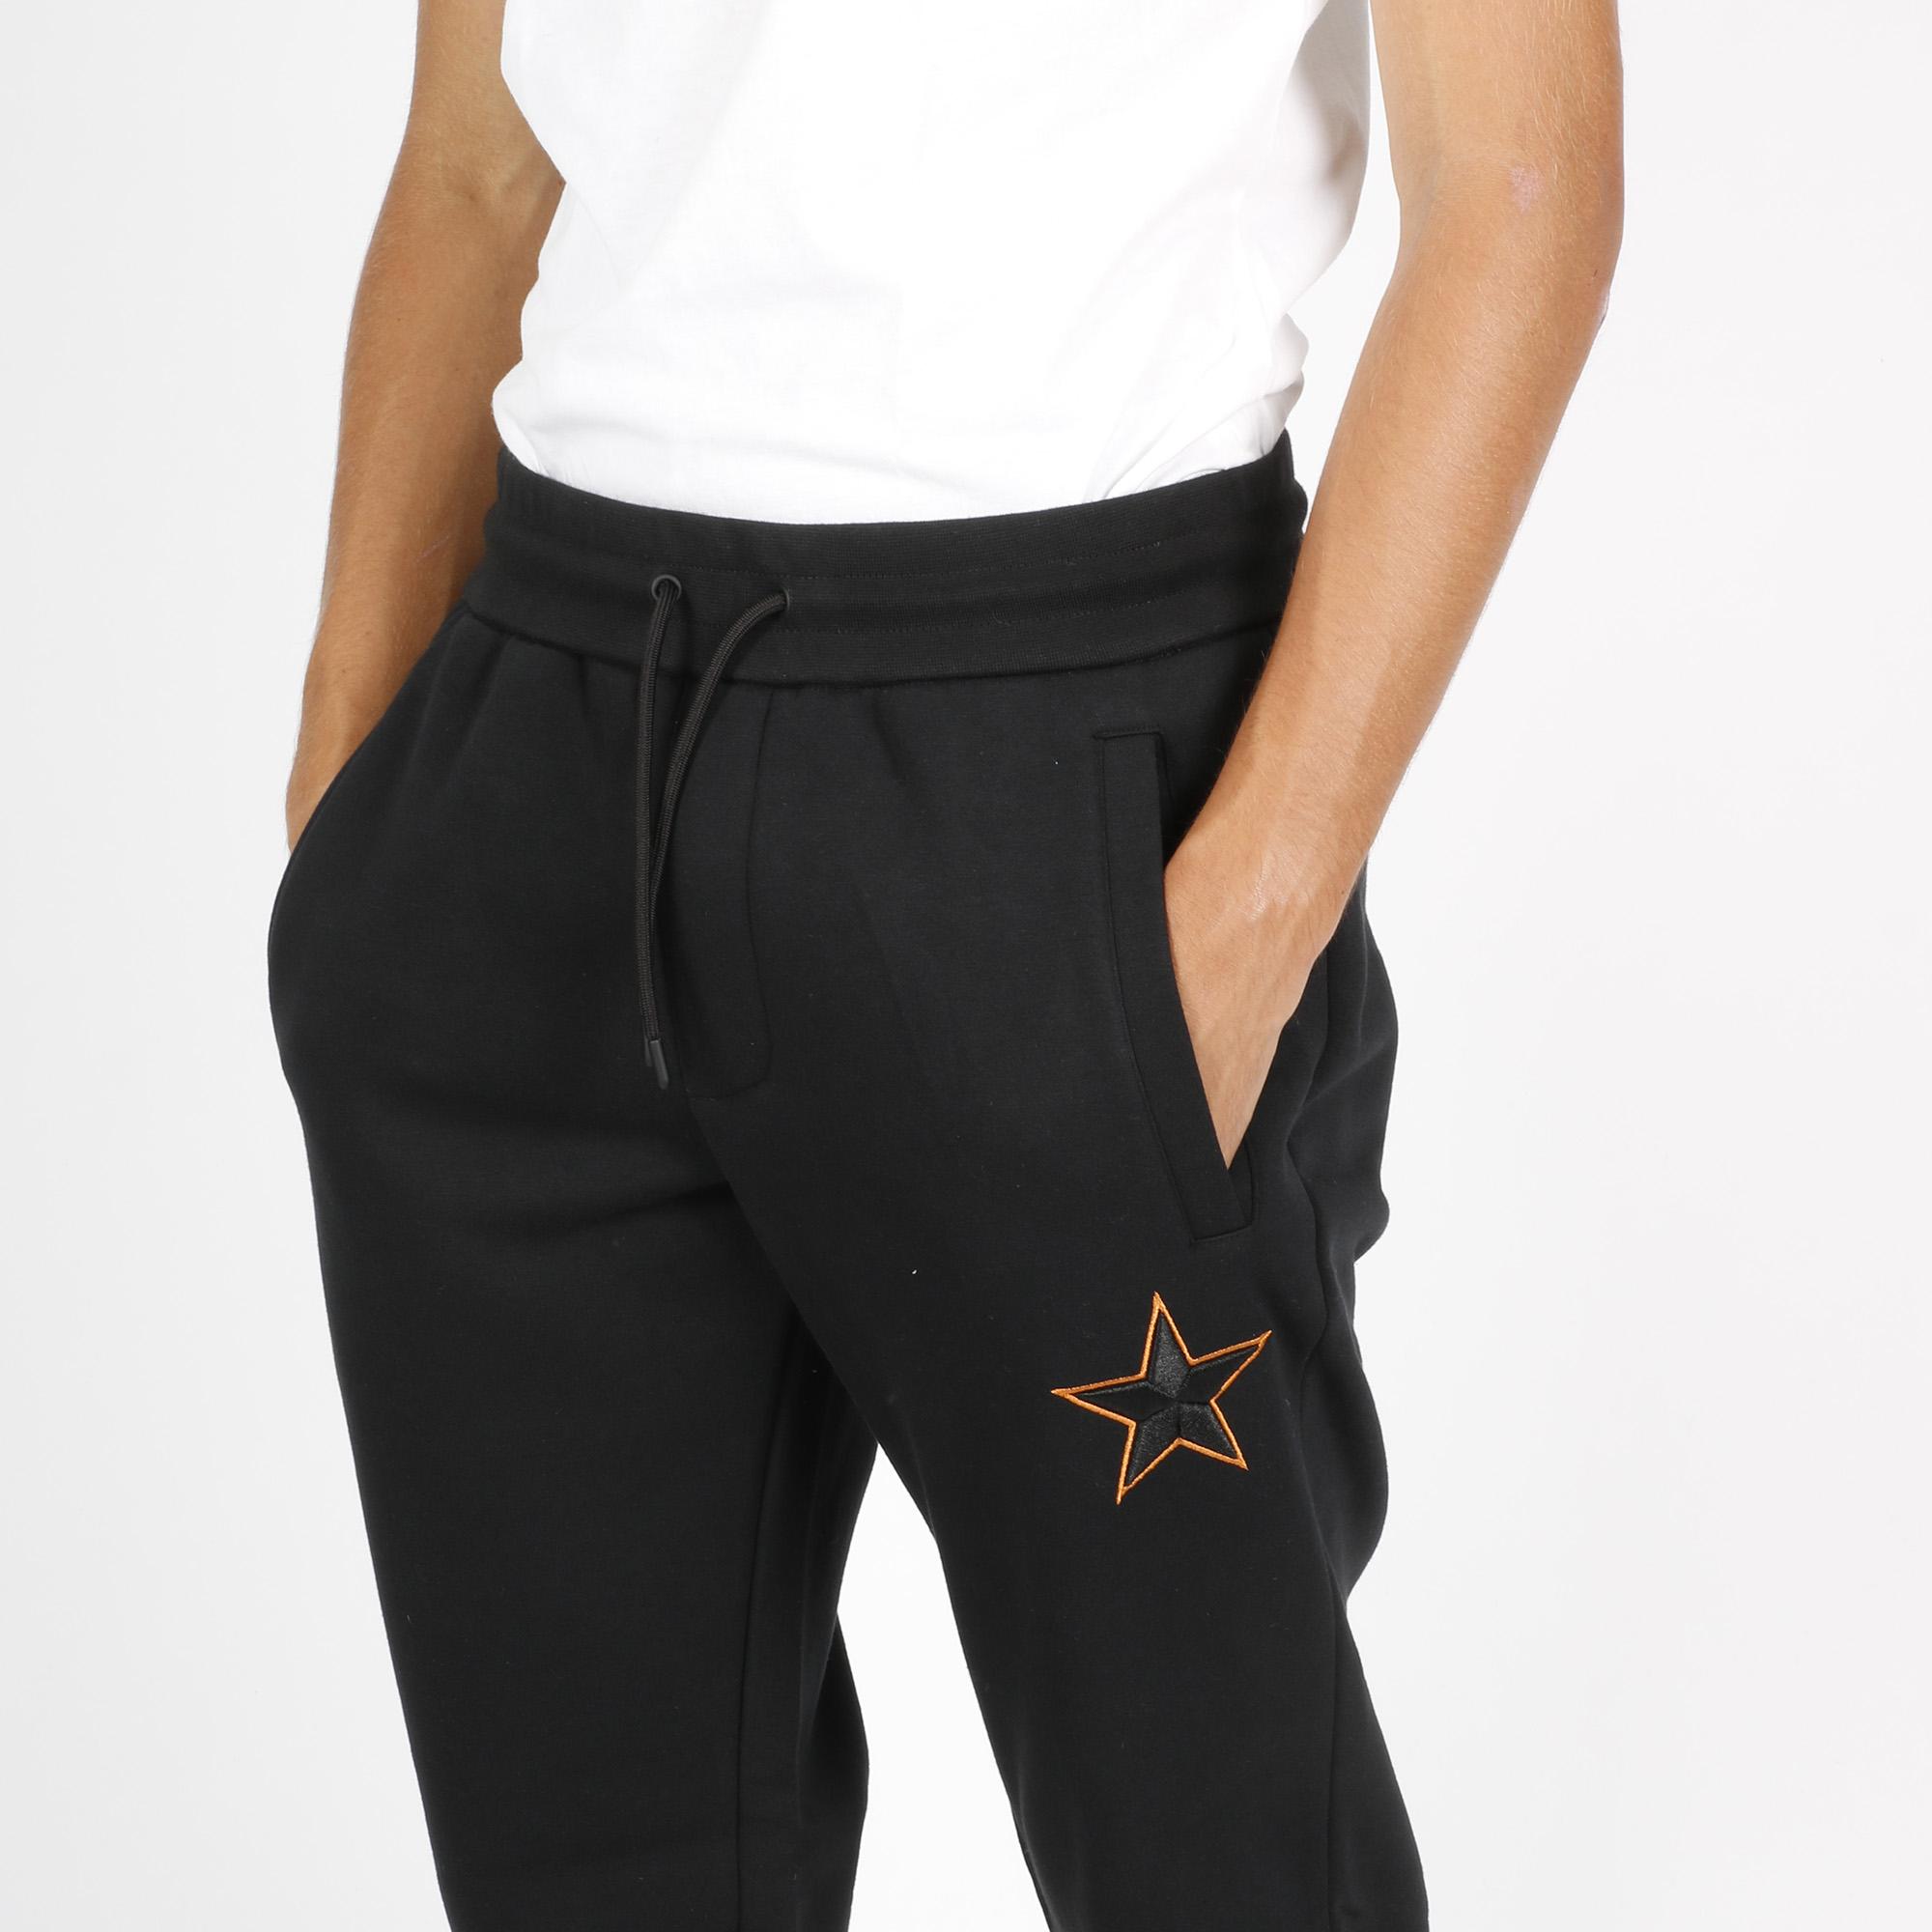 Pantalone stella ricamo - Nero